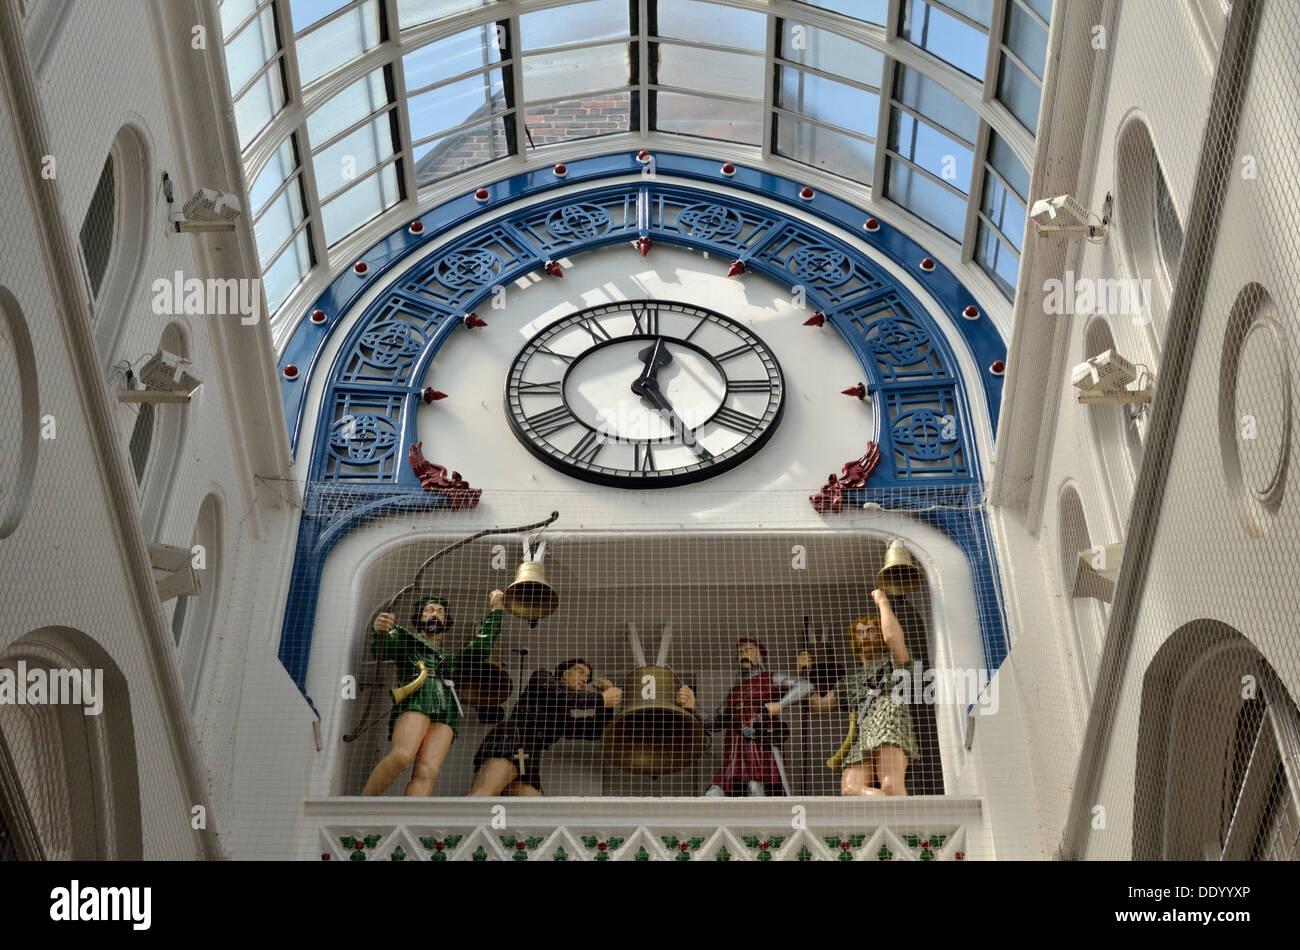 Thornton's Arcade interior detail, Leeds, South Yorkshire, UK - Stock Image